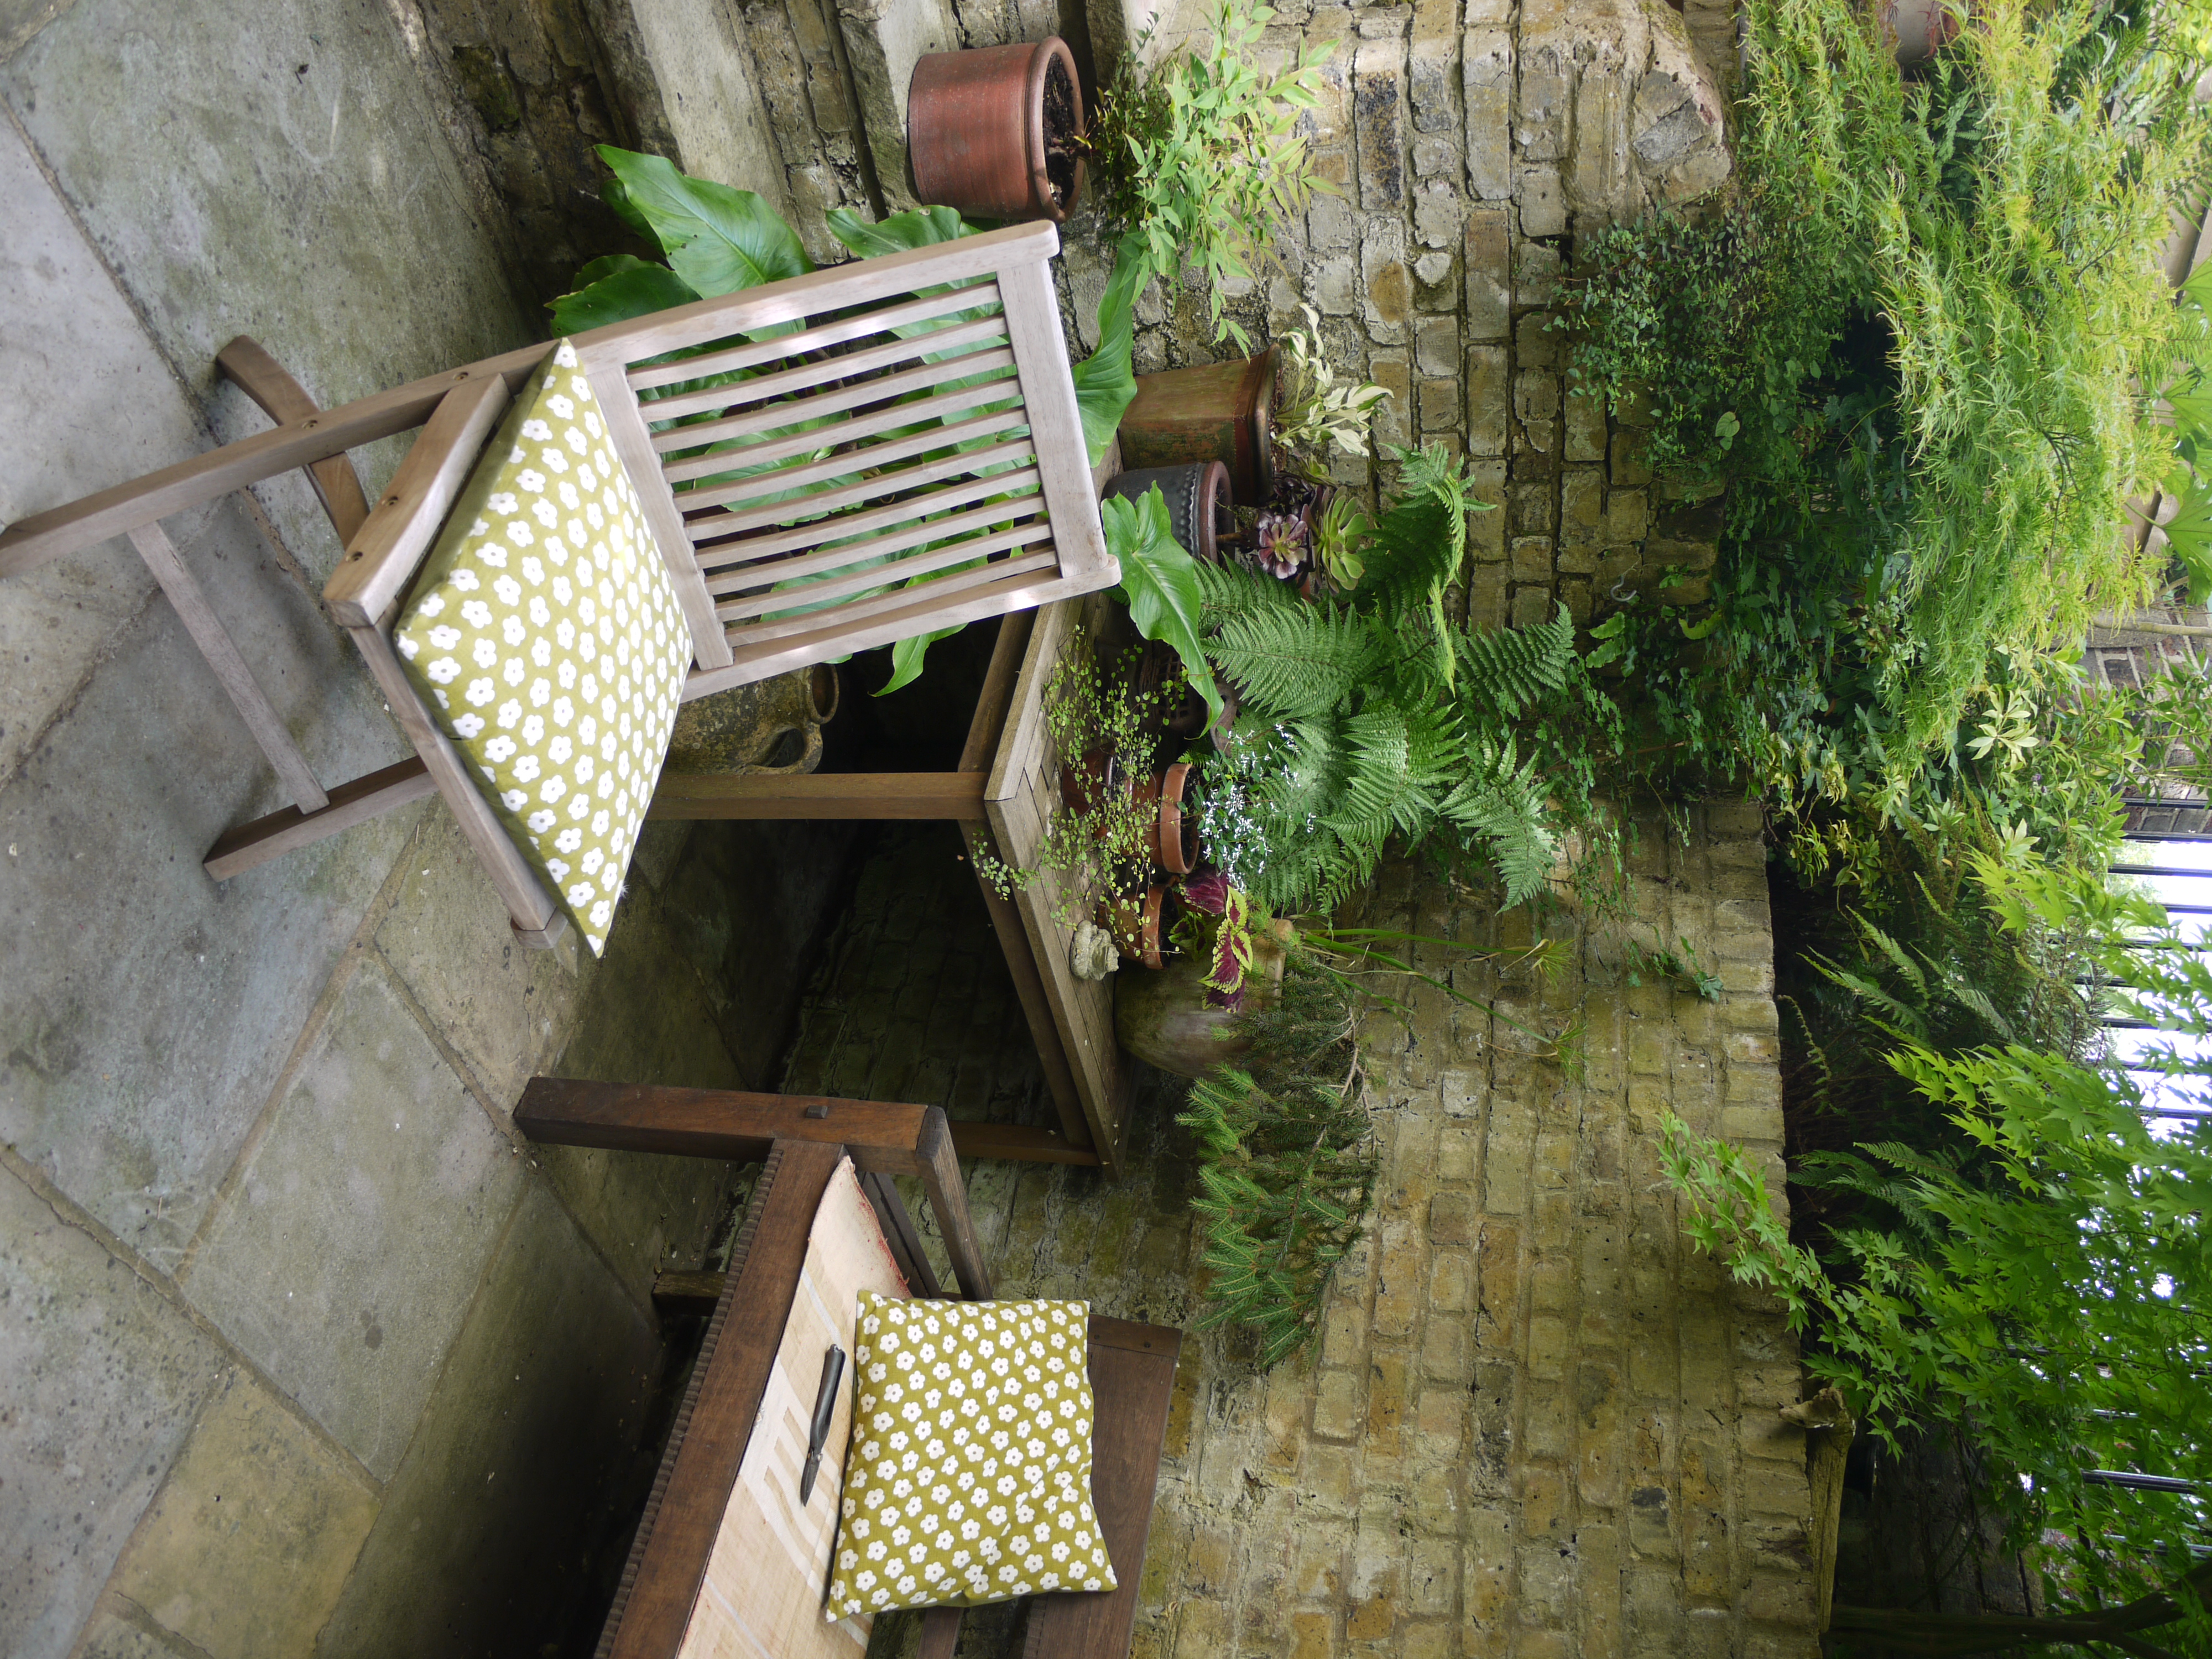 Fran's Back Garden